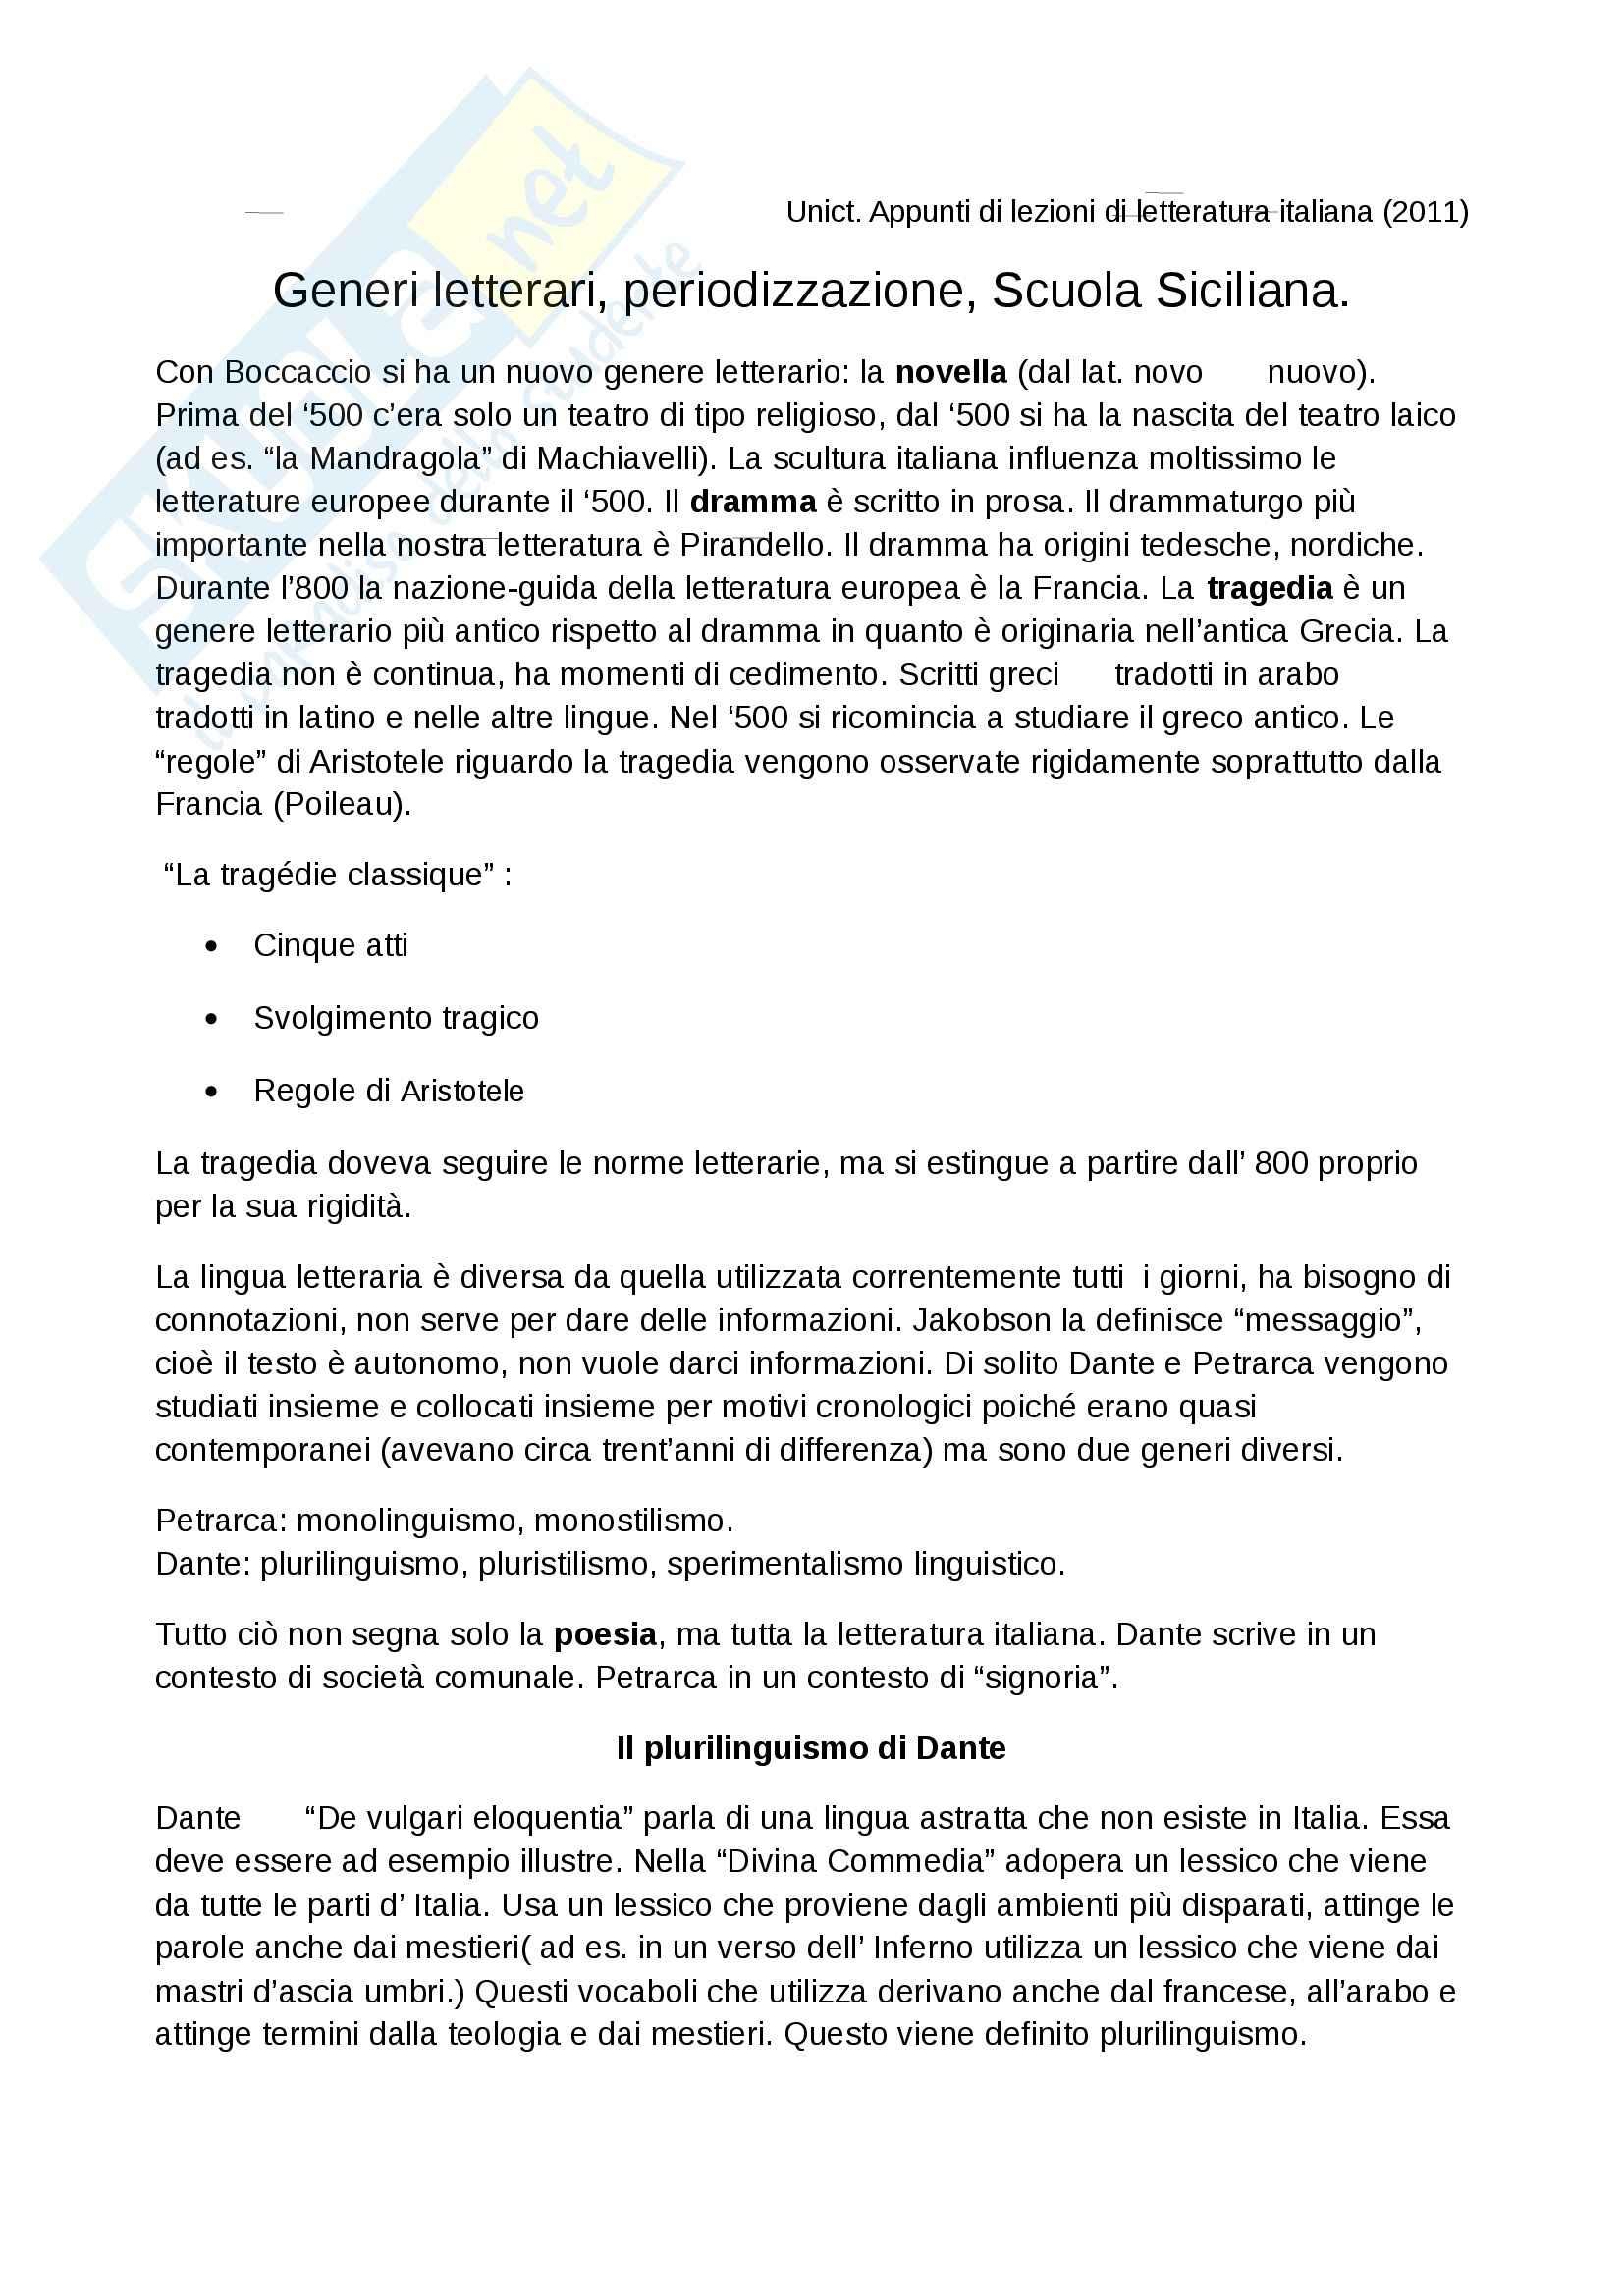 appunto G. Lombardo Letteratura italiana